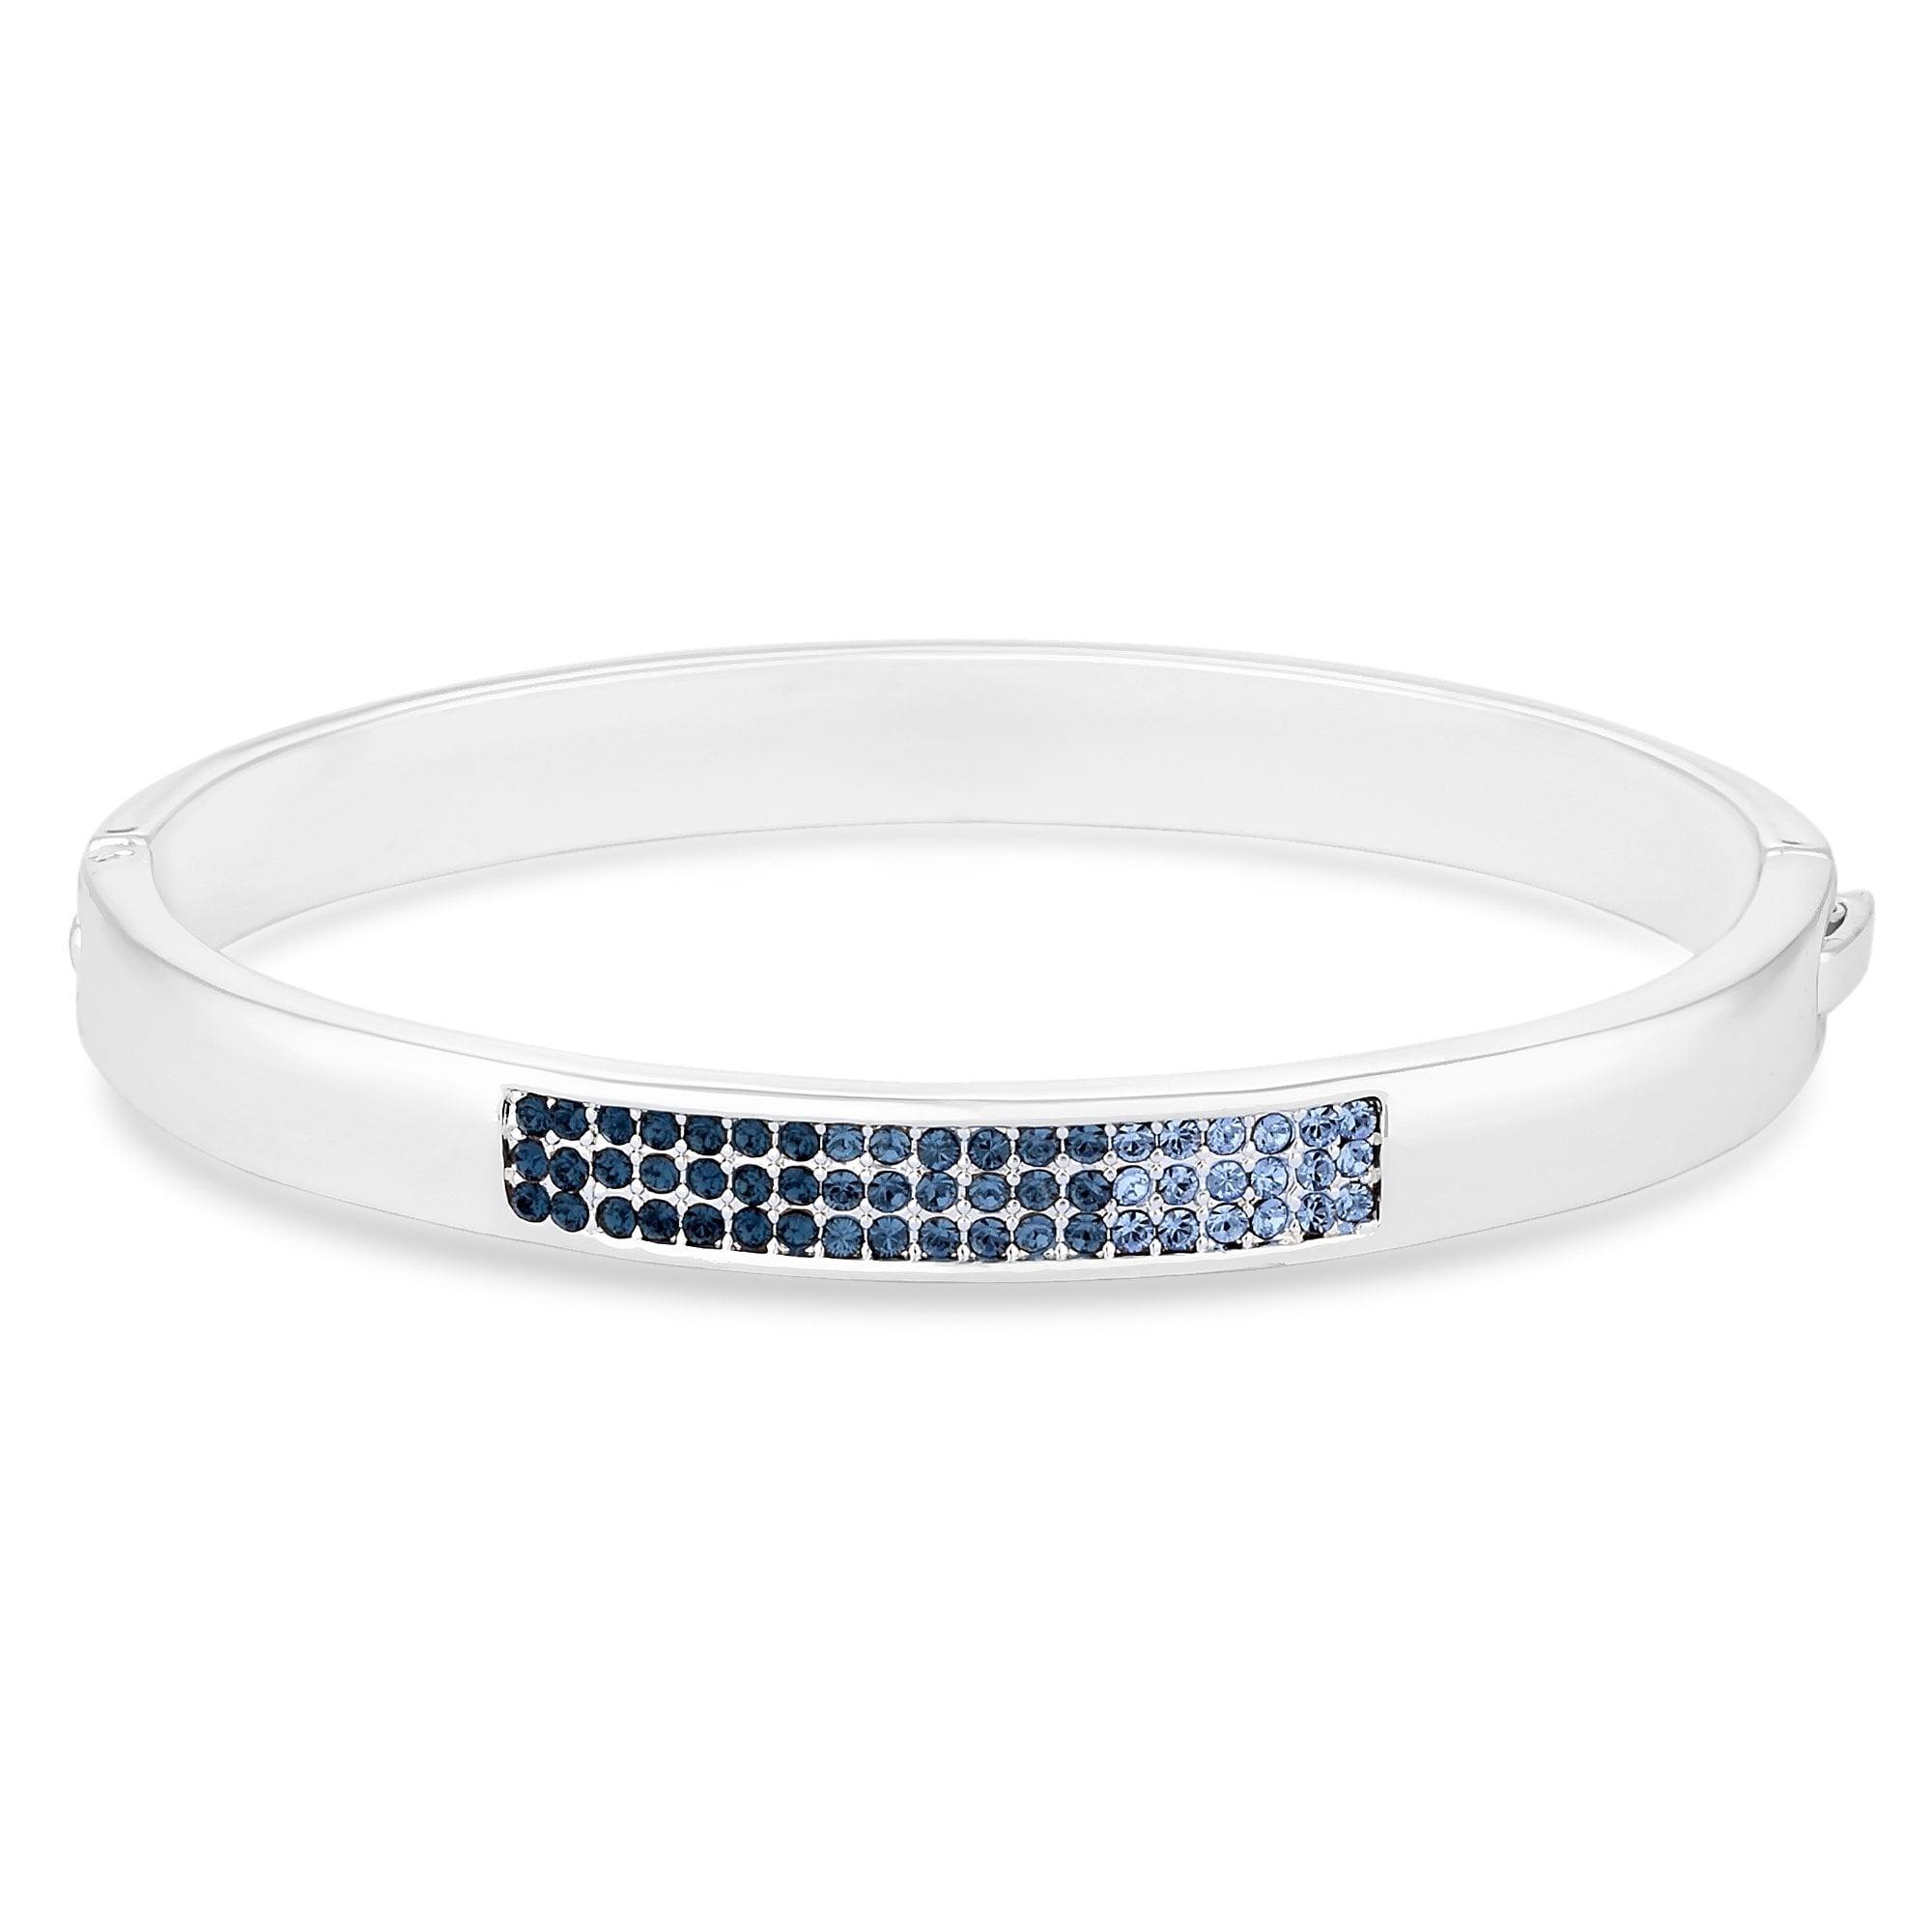 38cd728837b5 Jon Richard Silver Plated Blue Ombre Pave Bangle with Swarovski Crystals